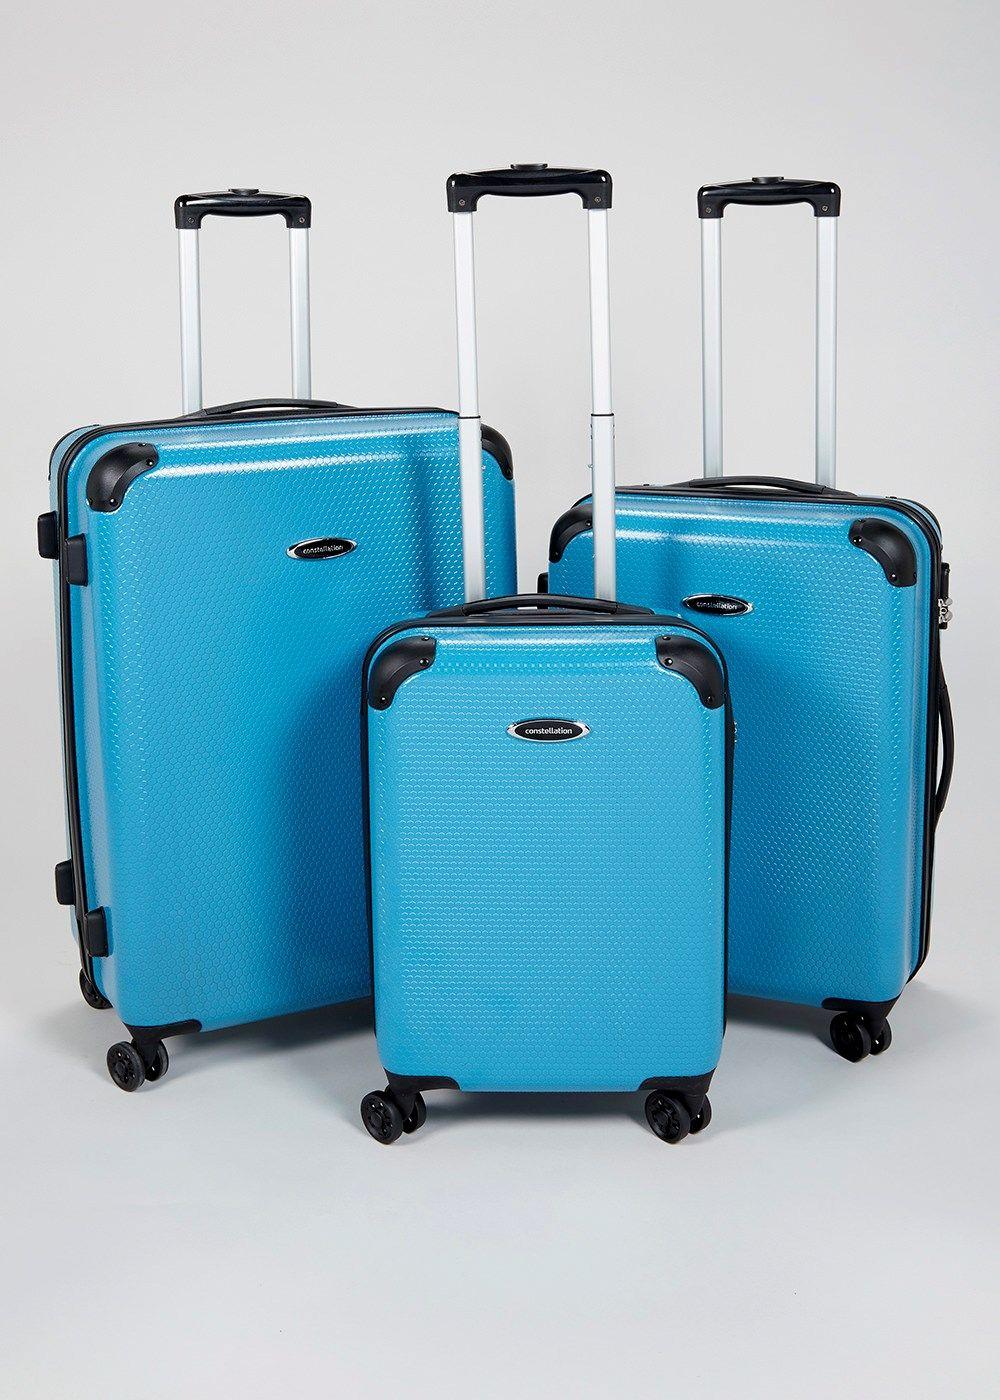 Constellation Honeycomb 4 Wheel Suitcase | Wish list | Pinterest ...